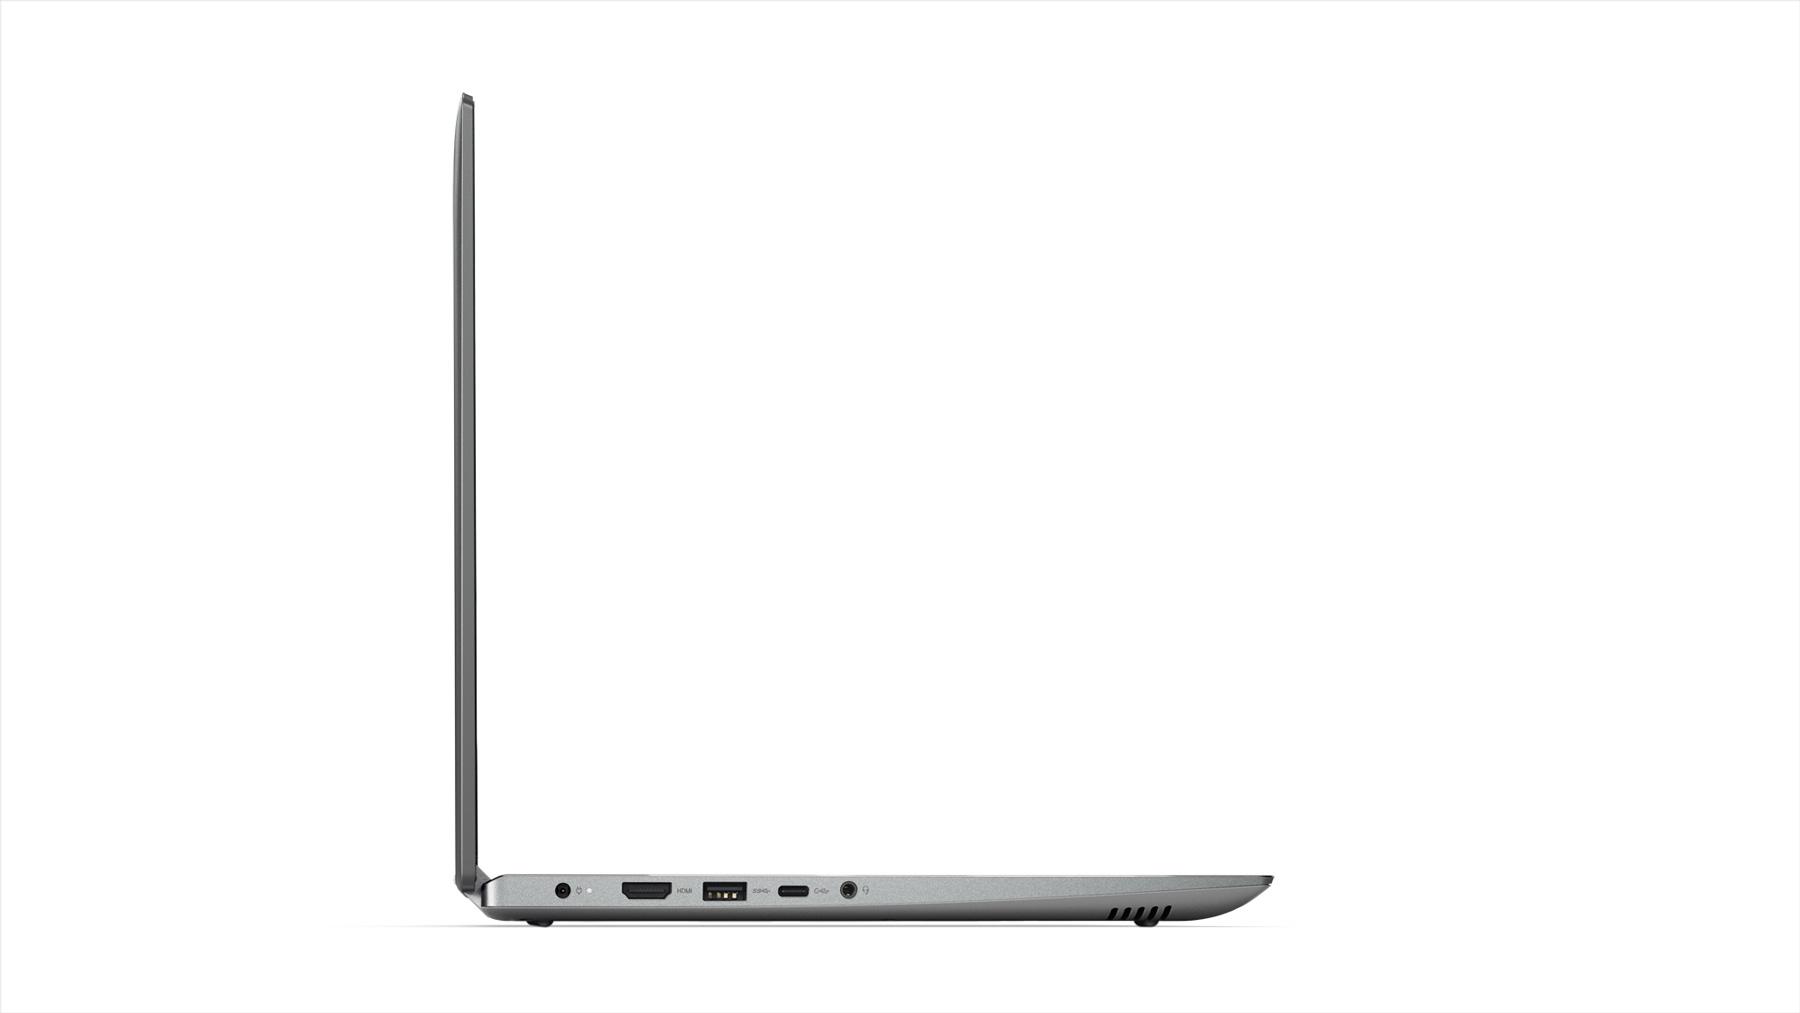 Фото  Ультрабук Lenovo Yoga 520 Mineral Grey (81C800F9RA)